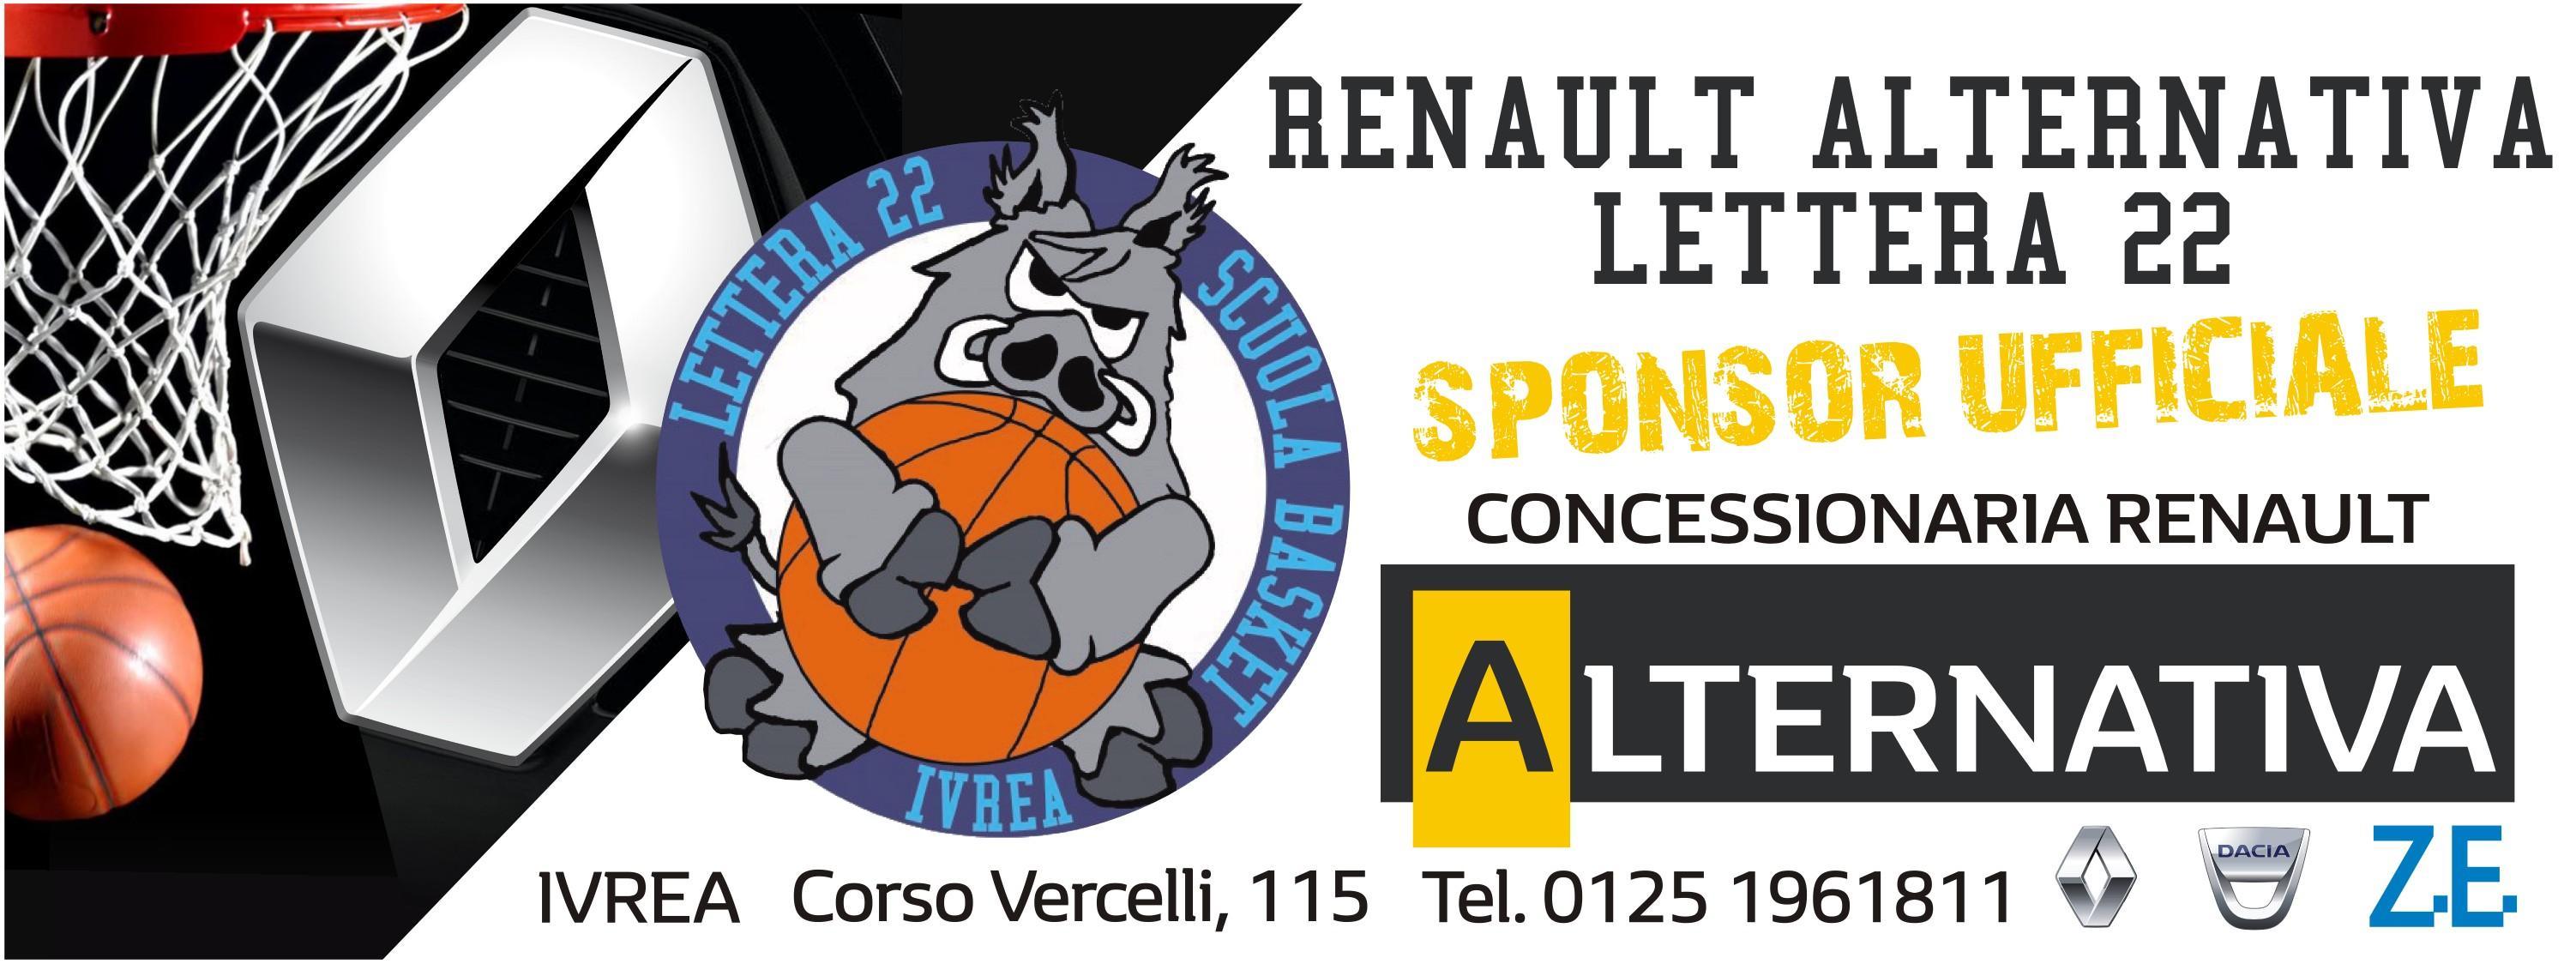 Renault Alternativa Sponsor Ufficiale Lettera22